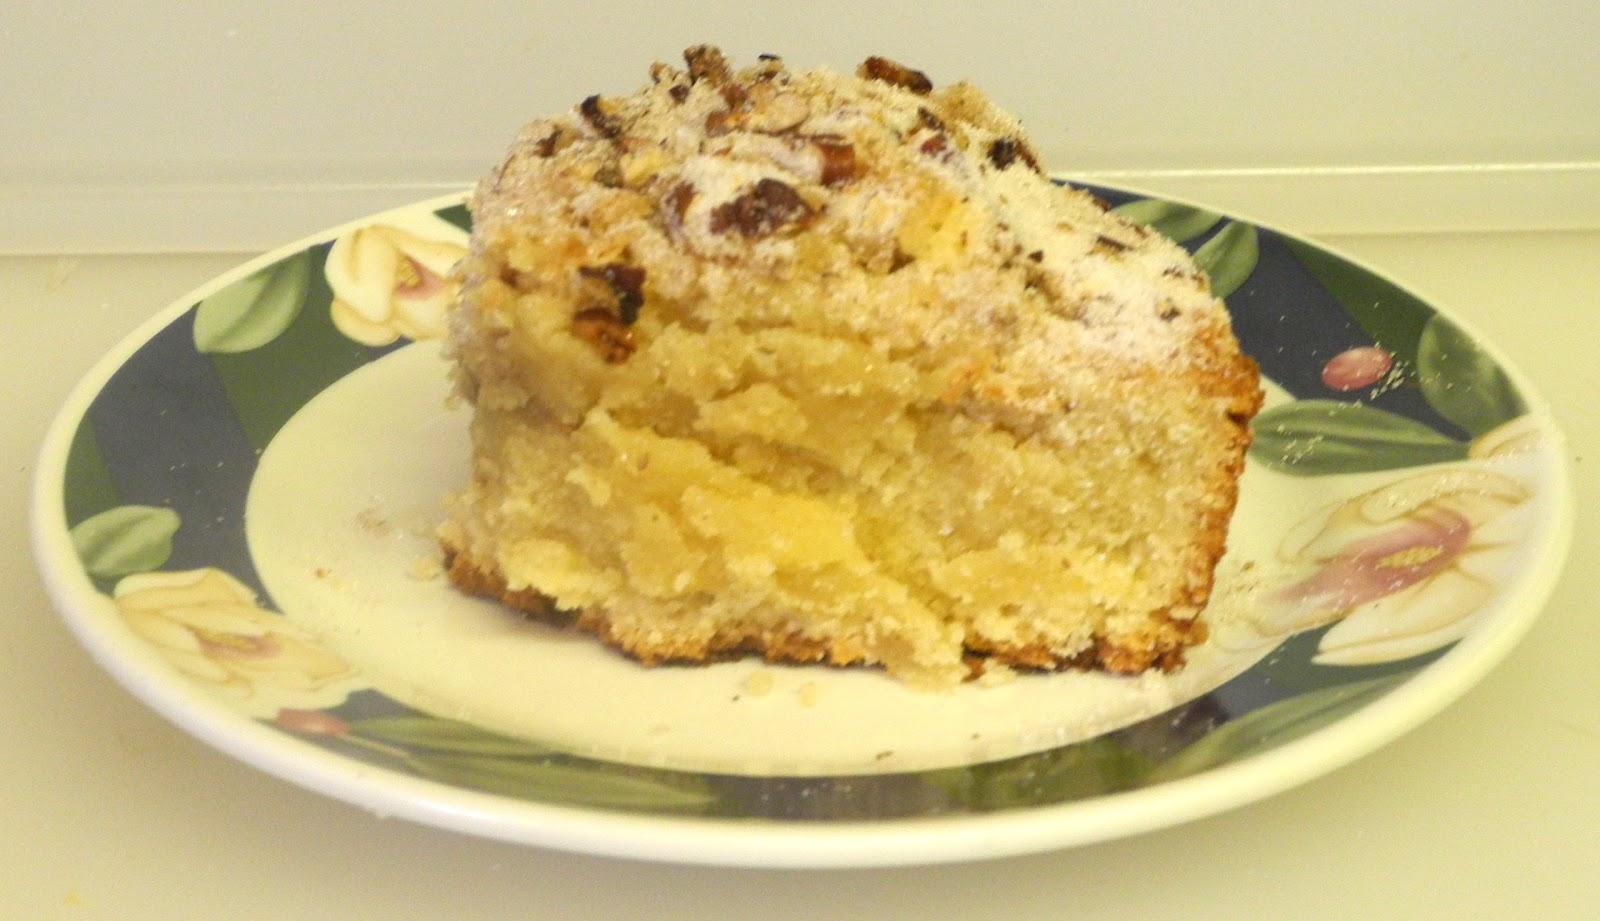 Blueberry Sour Cream Cake Nz